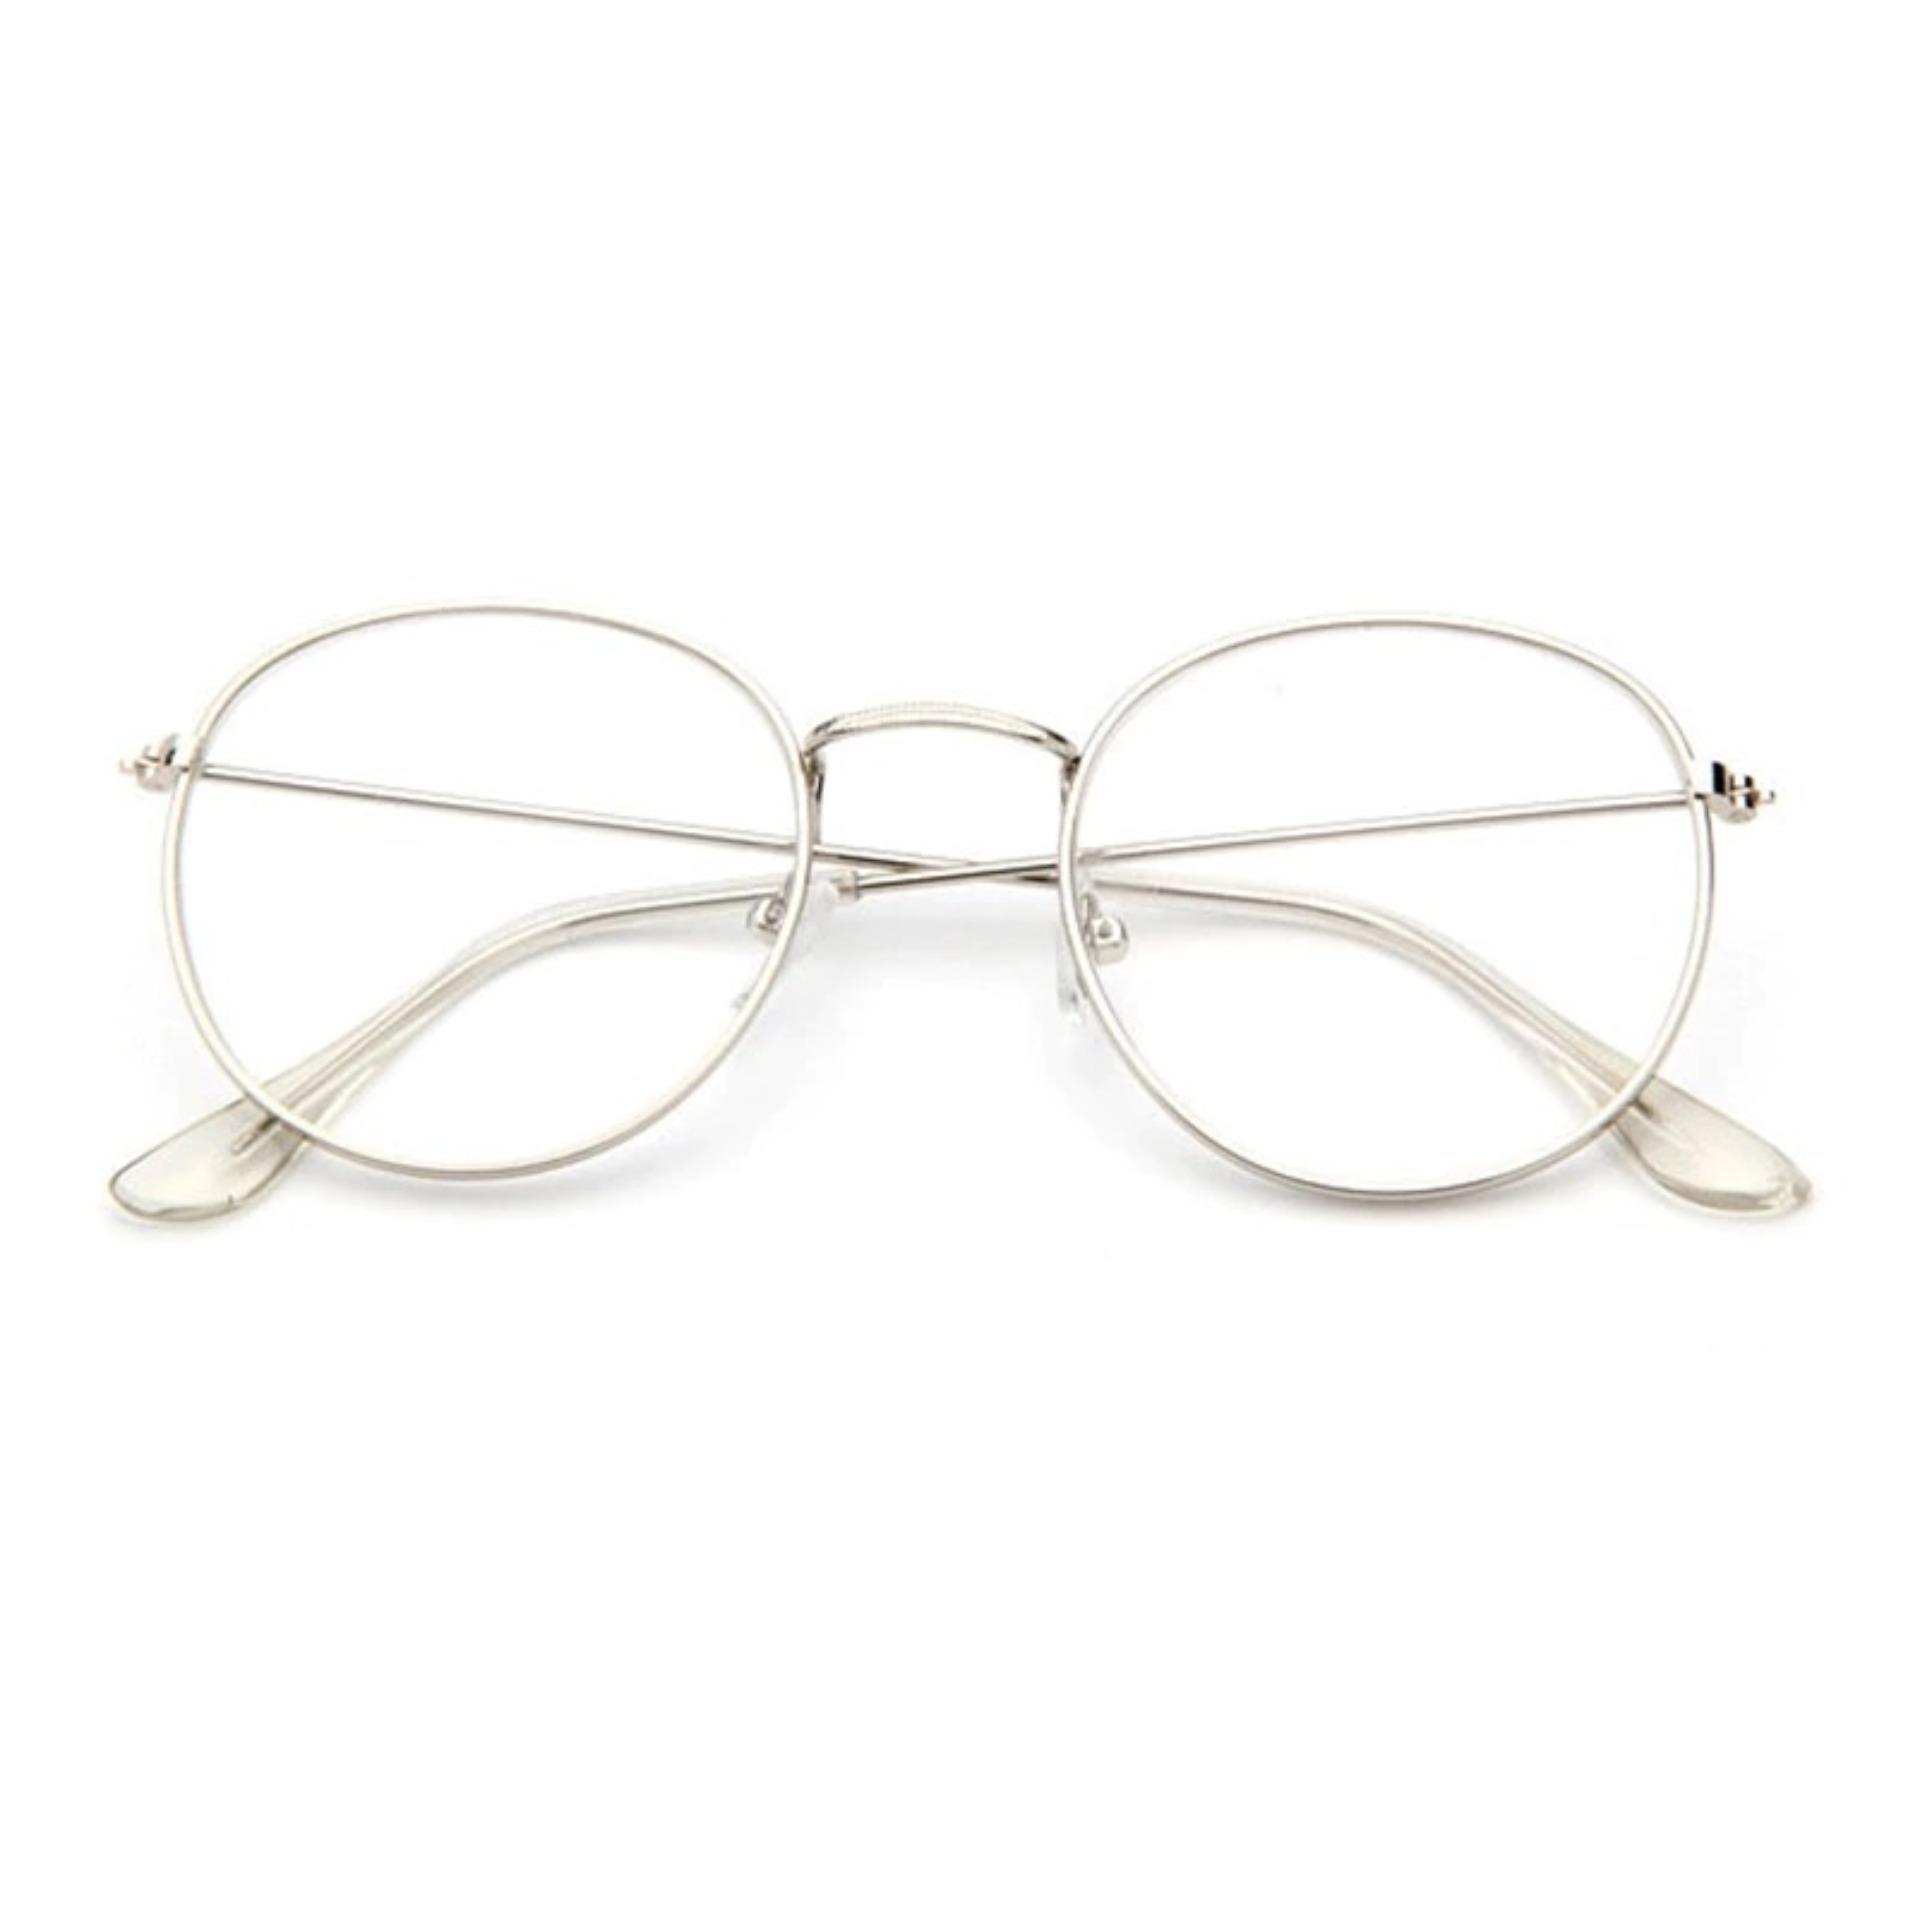 Vintage Fashion Sunglasses MN1000 - Kacamata wanita - Sabyan - nissa -  Populer eeed8d54ba